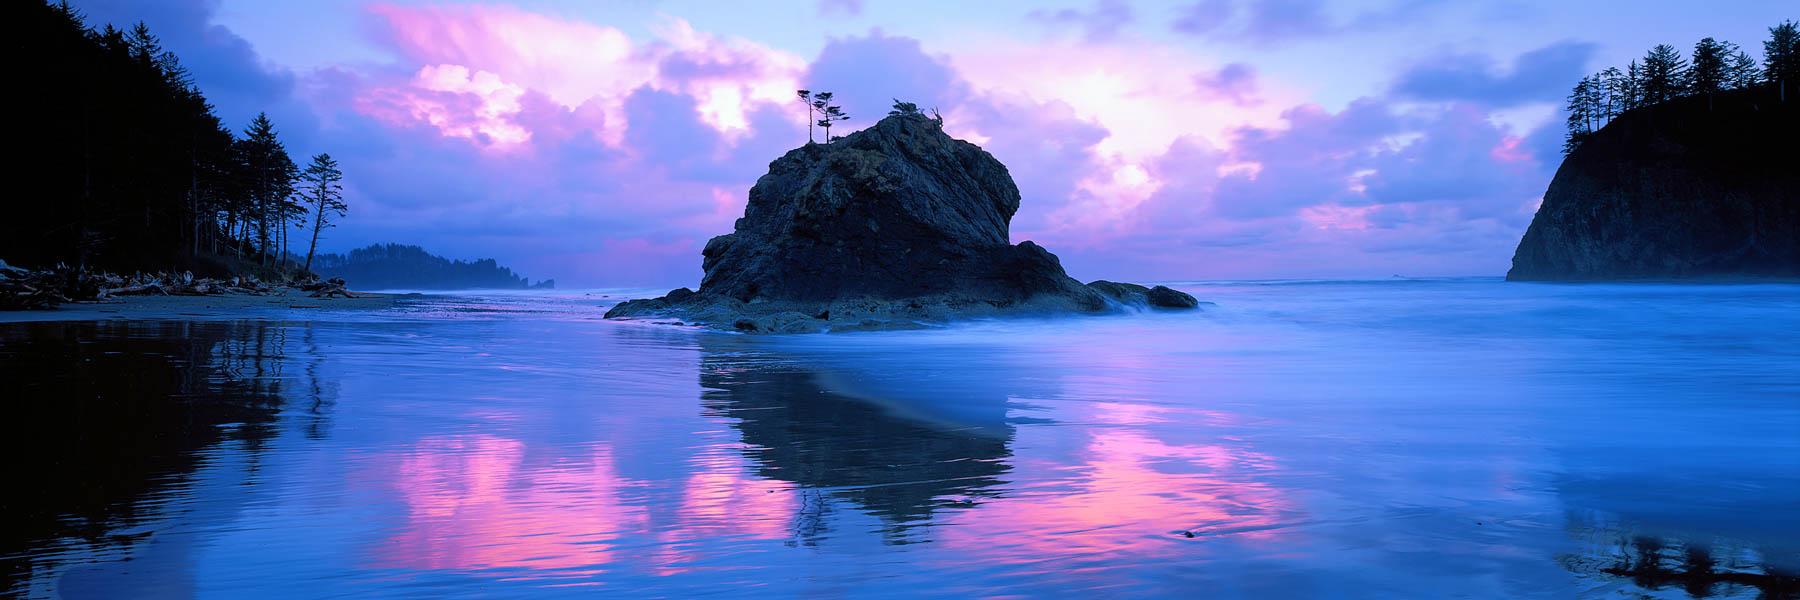 A glowing sunrise over sea stacks, Washington state, USA.